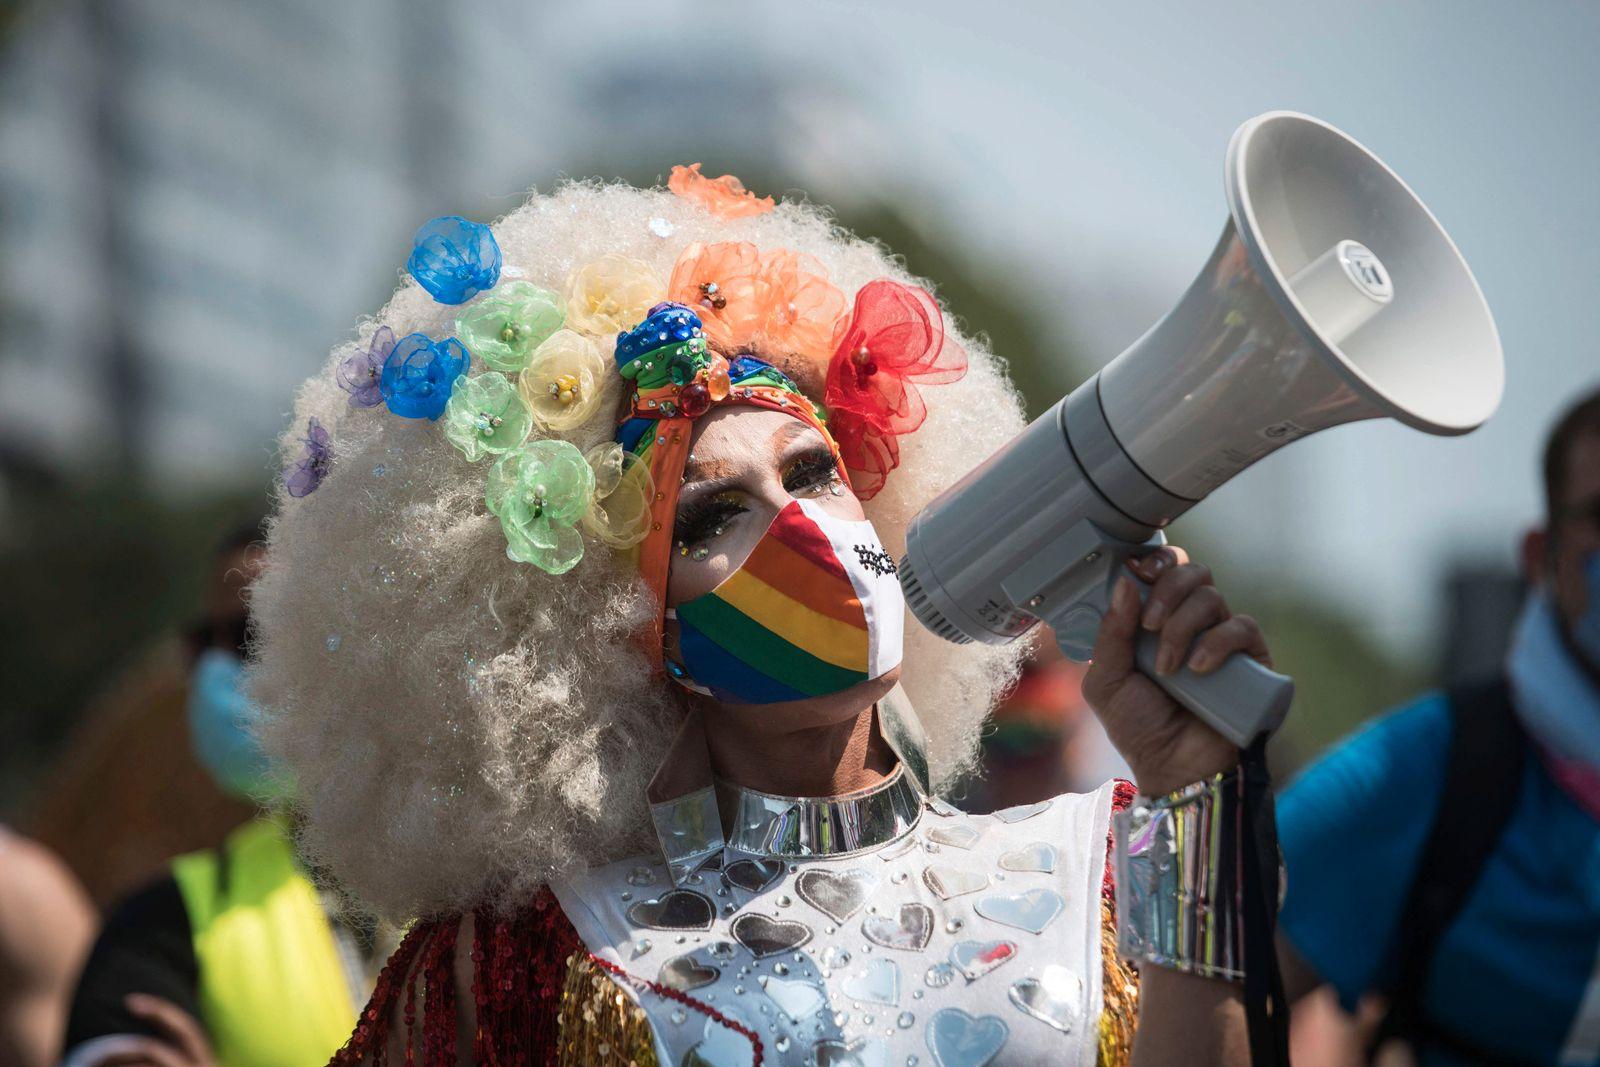 GERMANY-HOMOSEXUALITY-GENDER-POLITICS-DEMONSTRATION